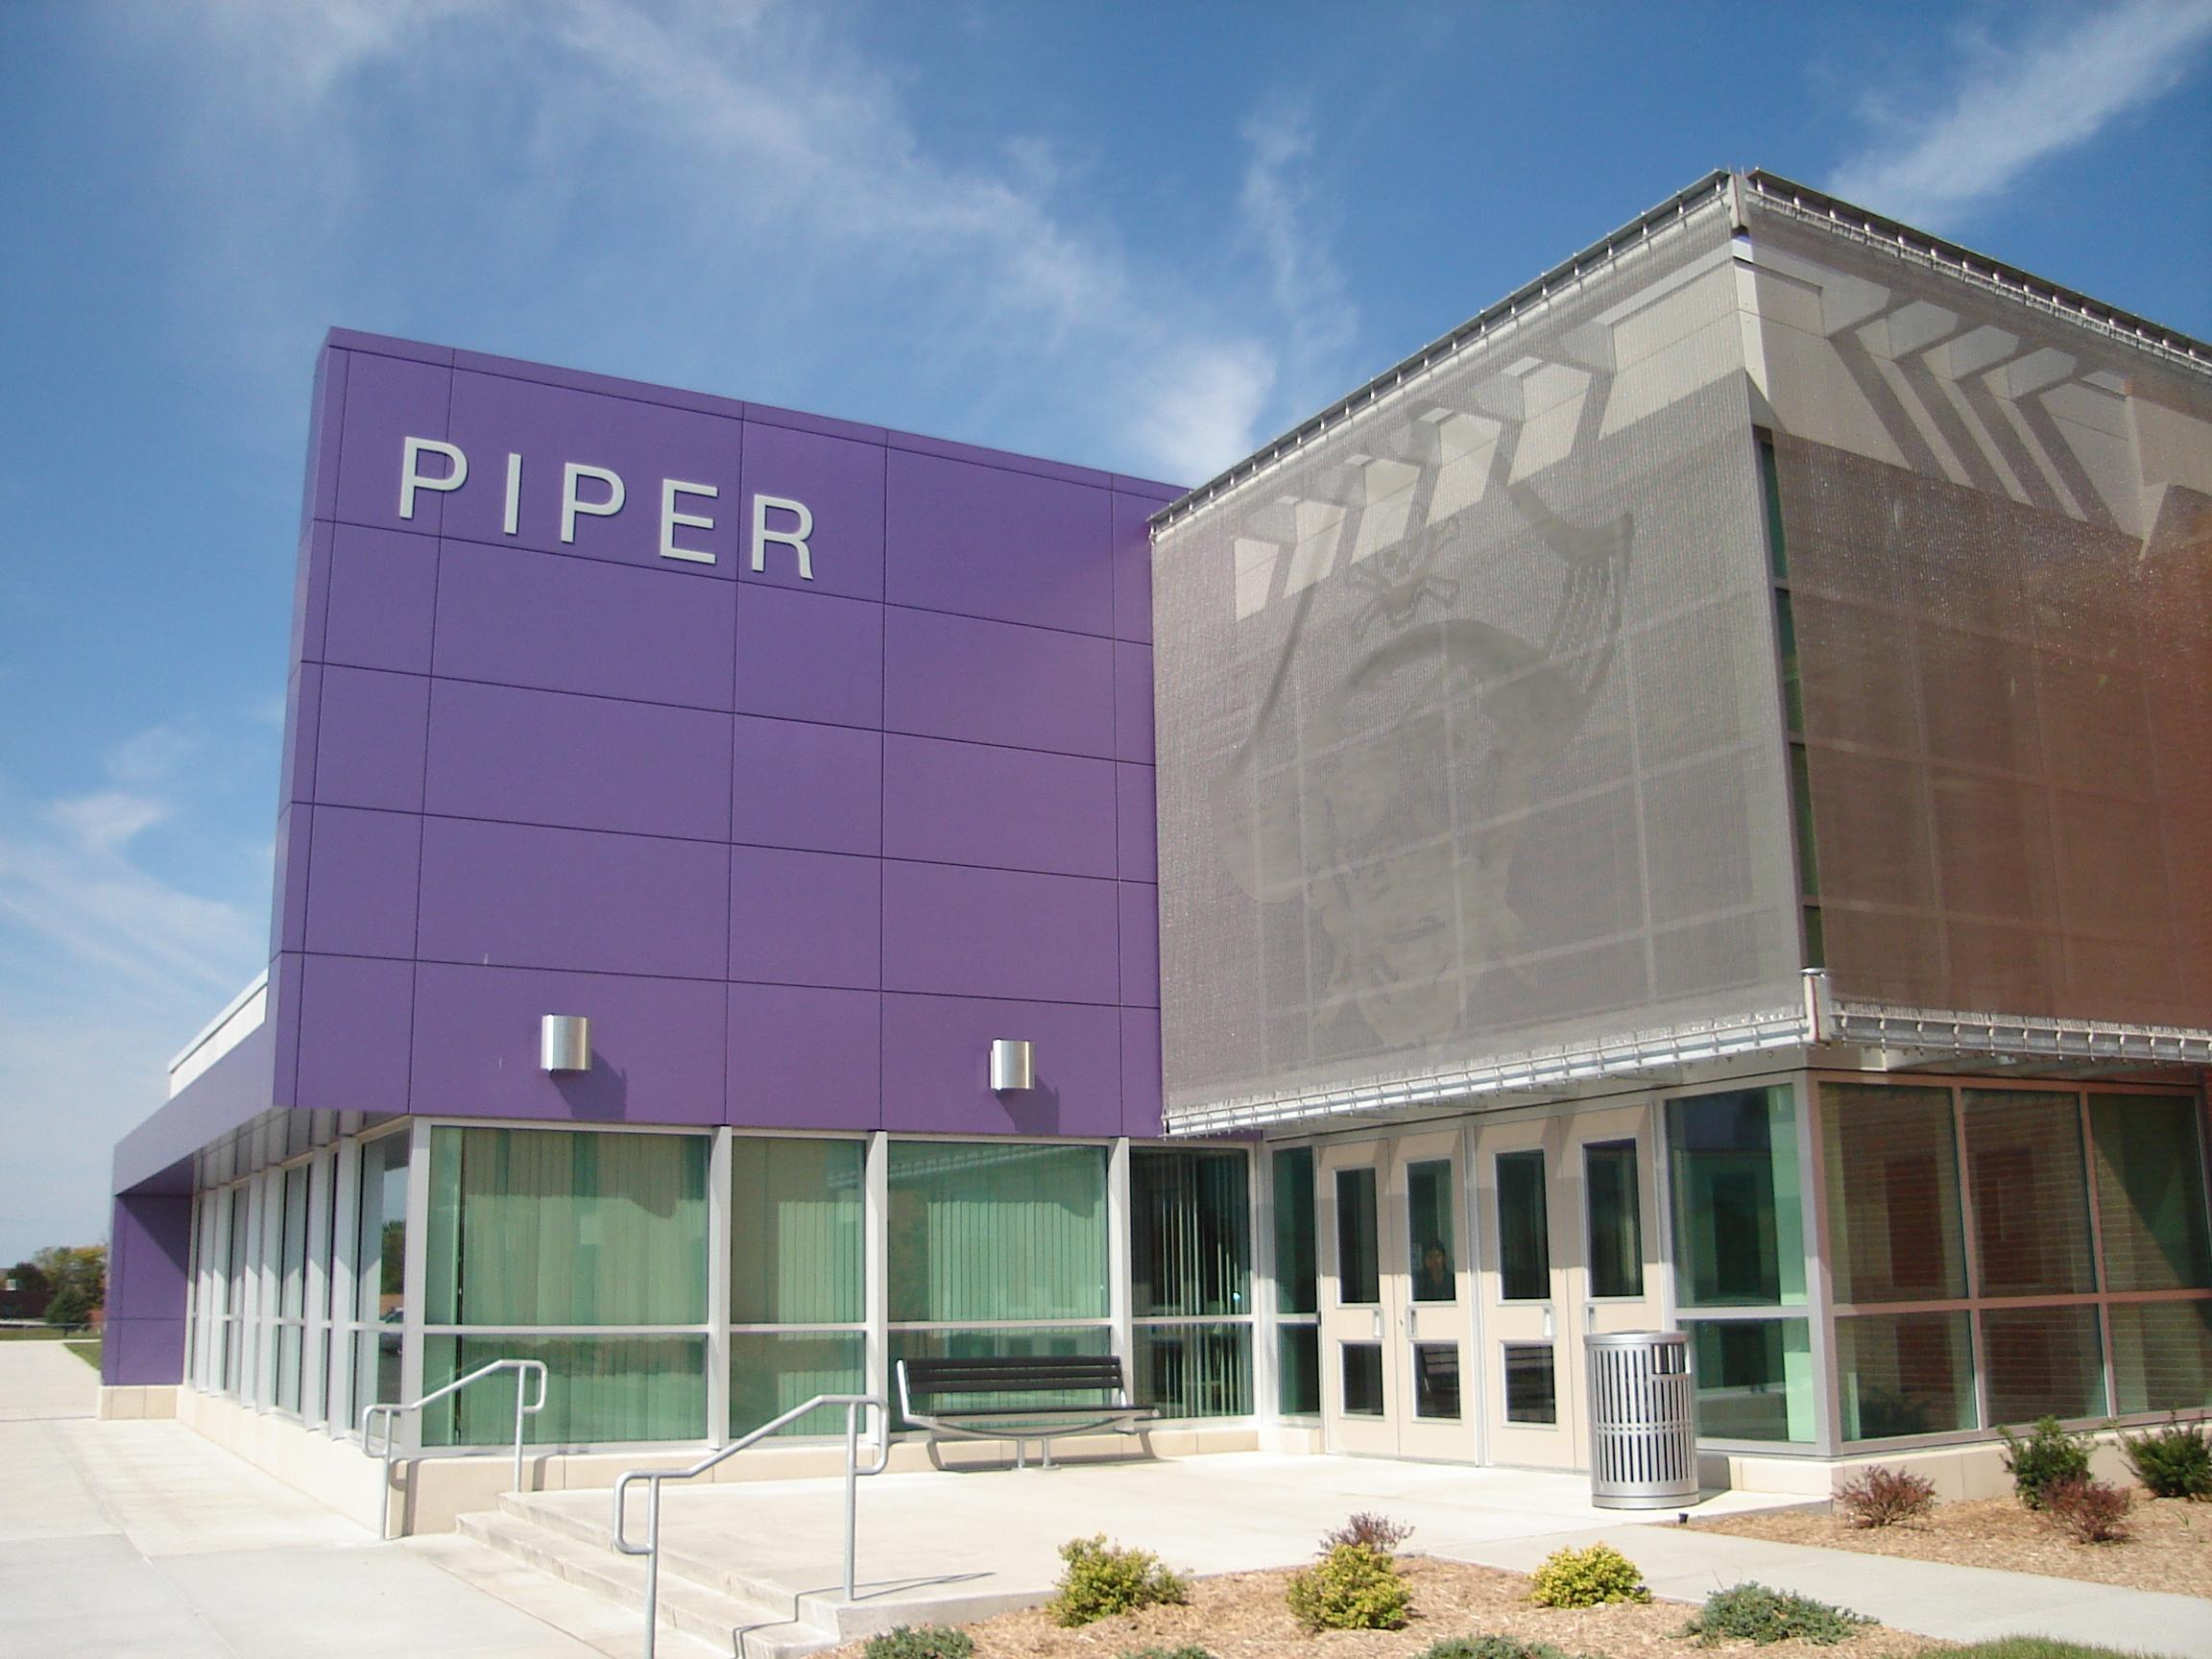 Piper High School (Kansas City)